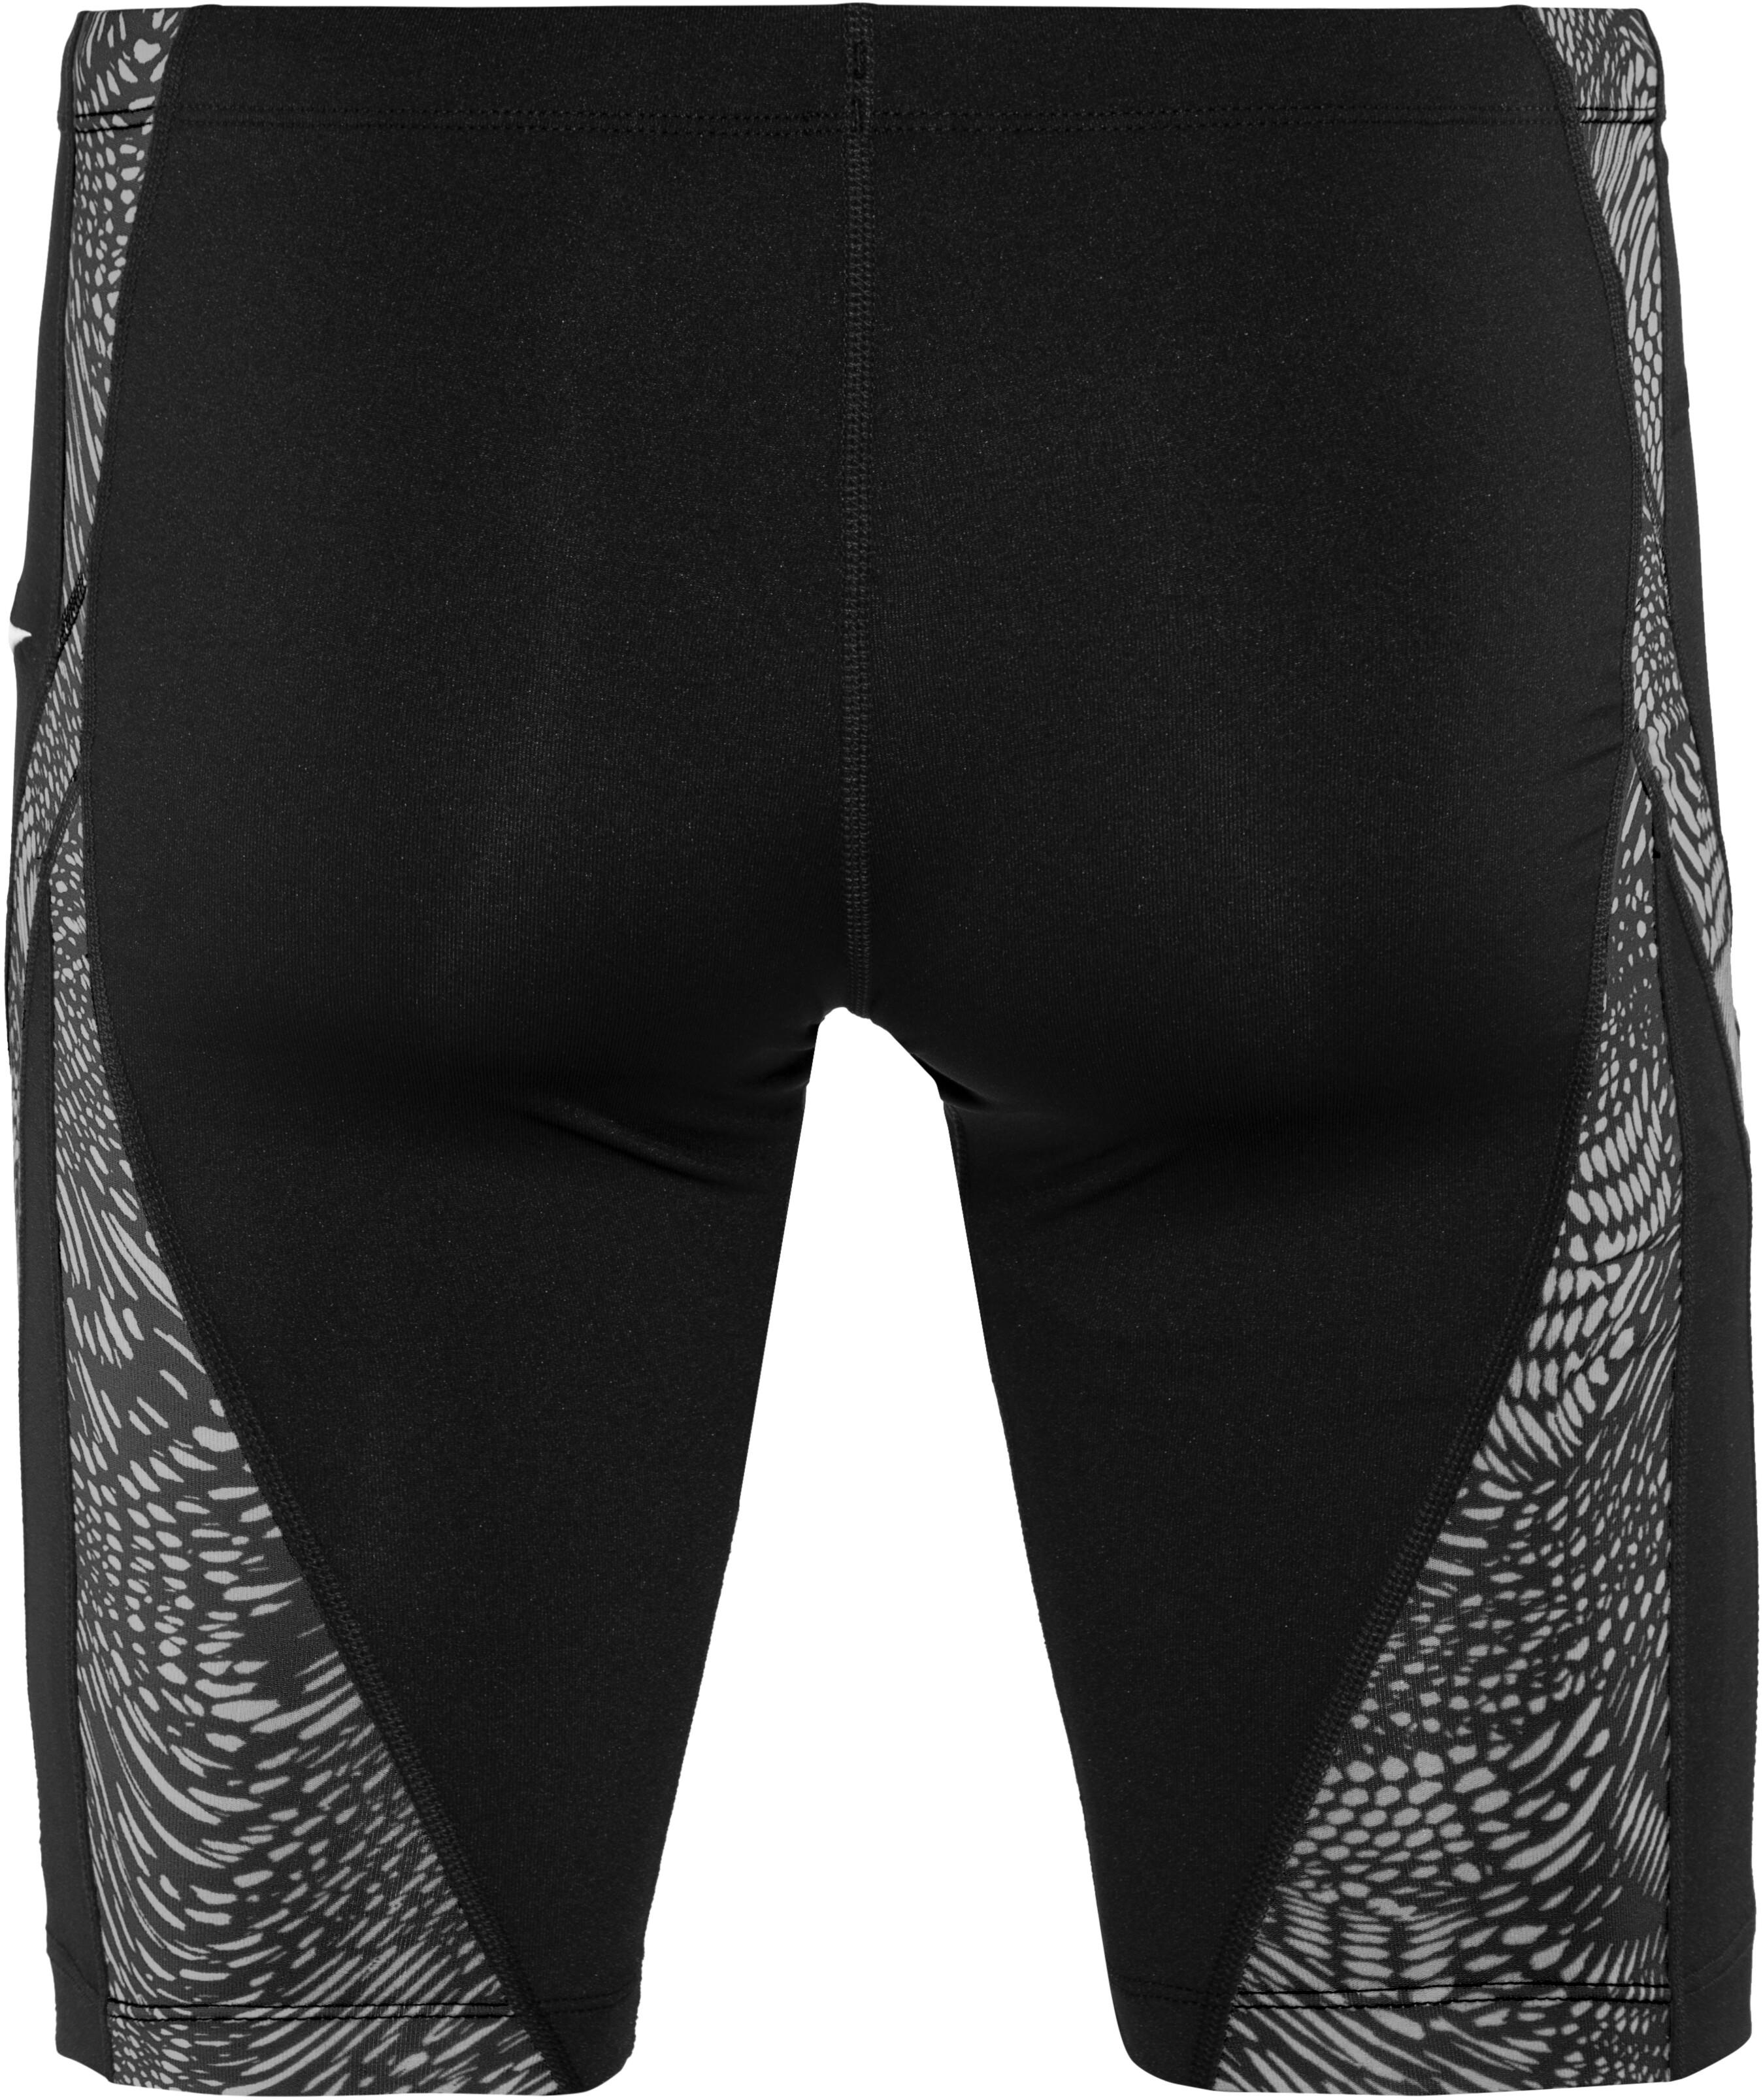 Nike Swim Geo Alloy Badbyxor Herr grå svart - till fenomenalt pris ... 50b65c5b08bf9